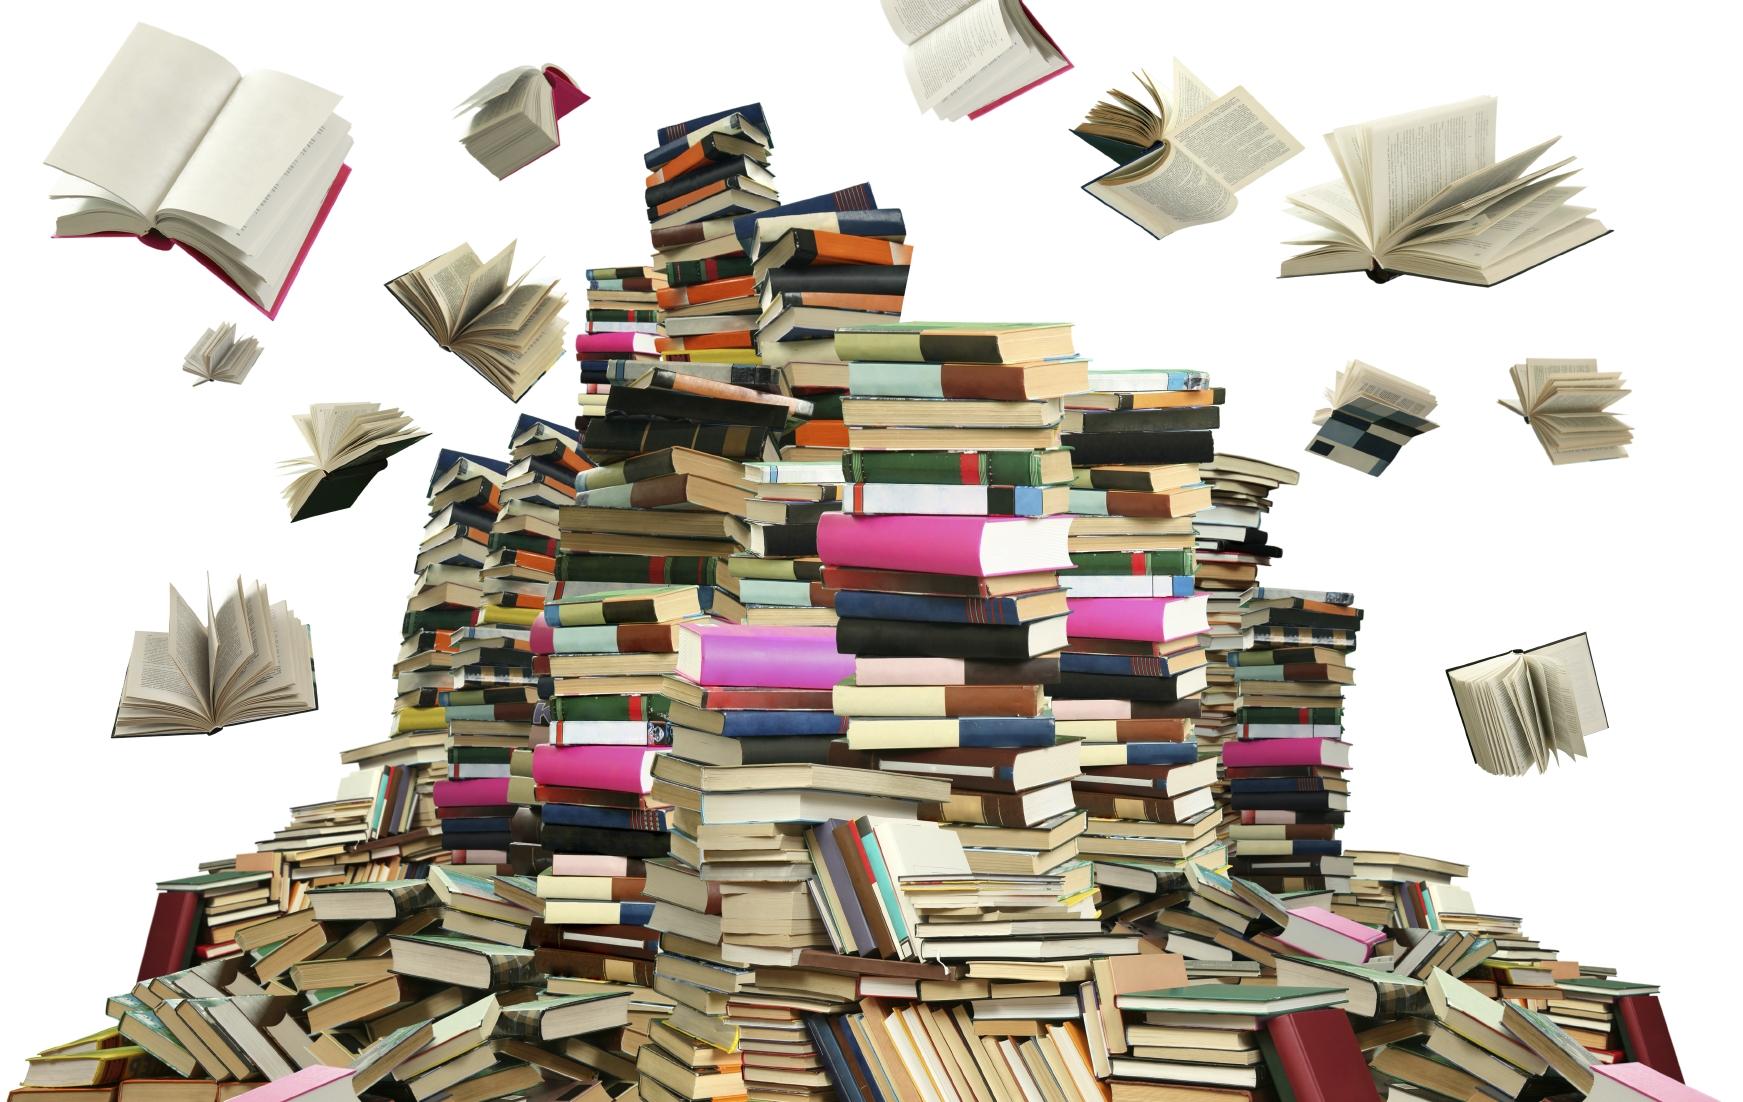 pileofbooks.jpg